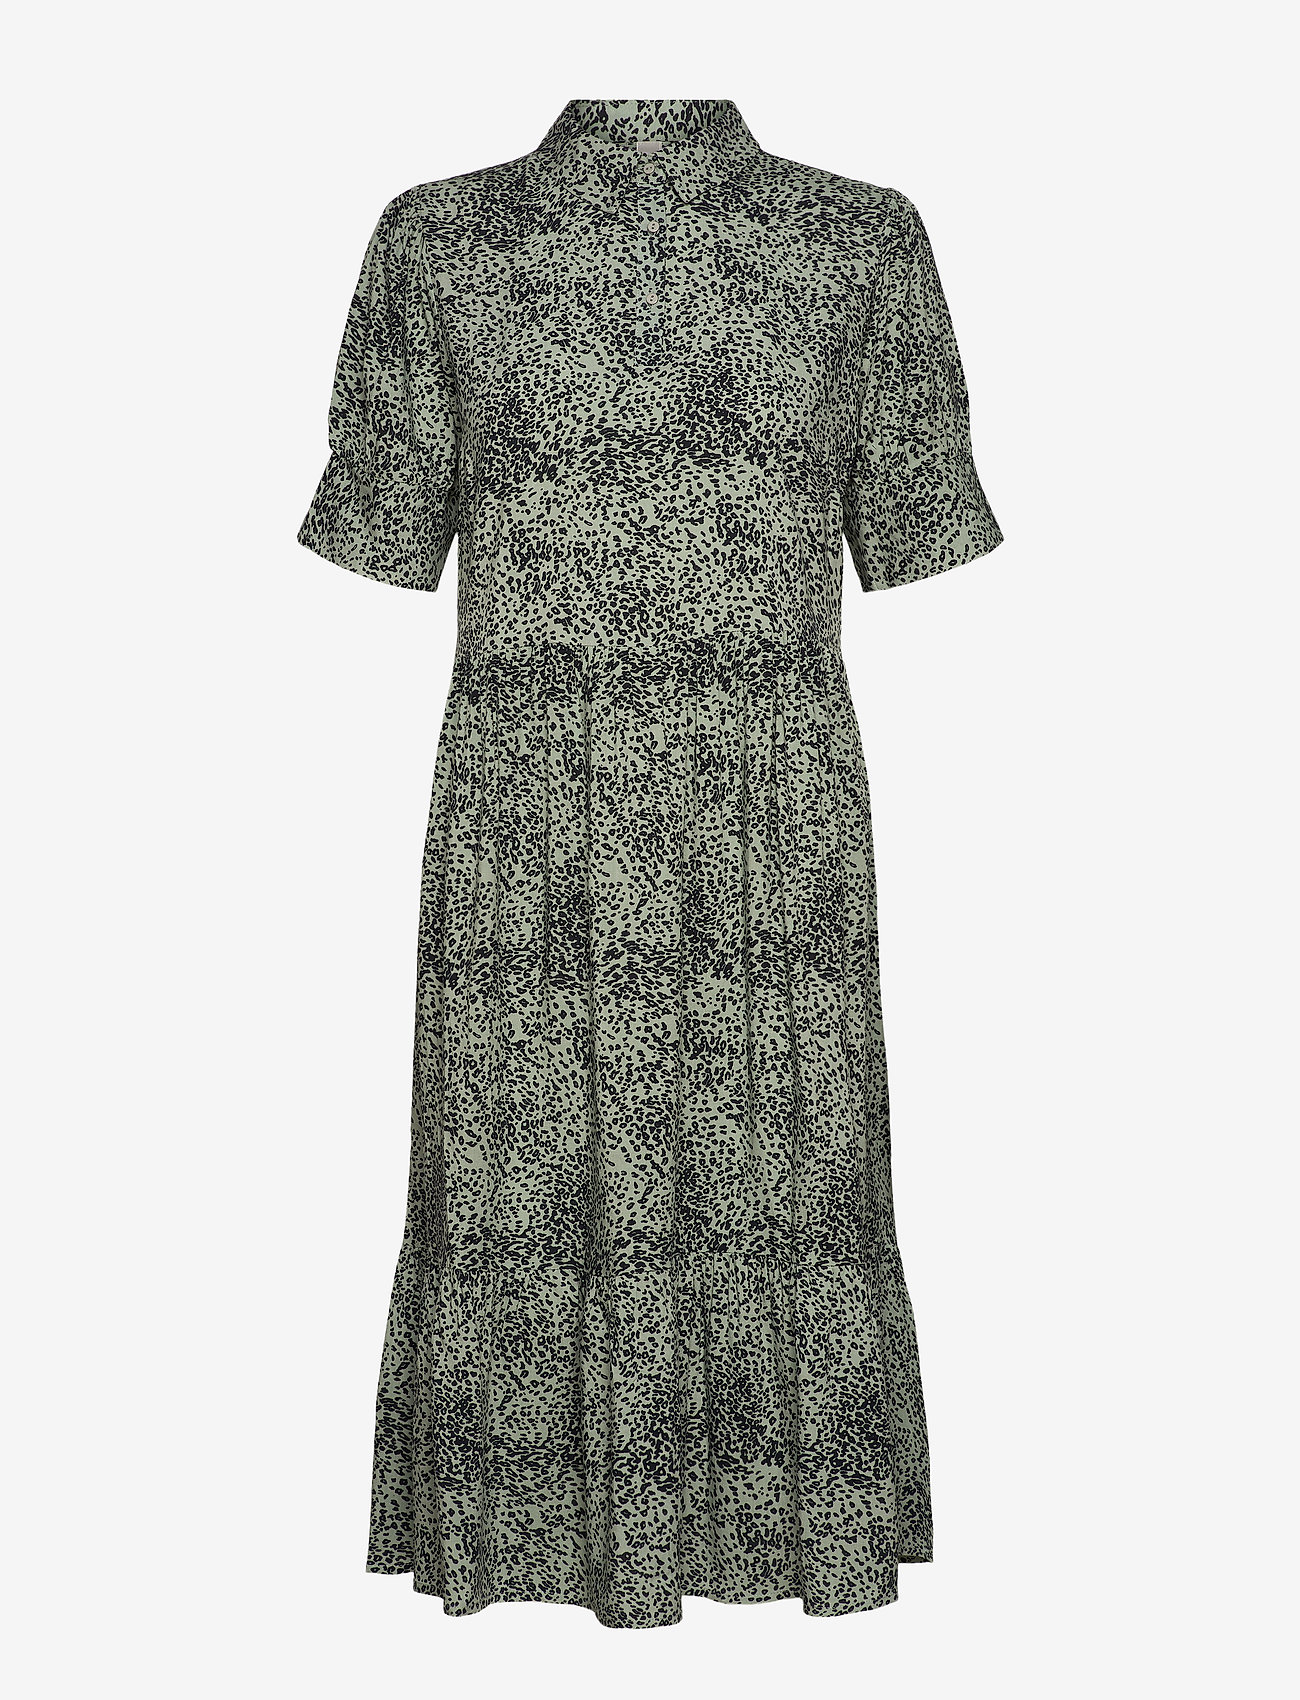 Soyaconcept - SC-NIKA - everyday dresses - 7580c mineral green combi - 0